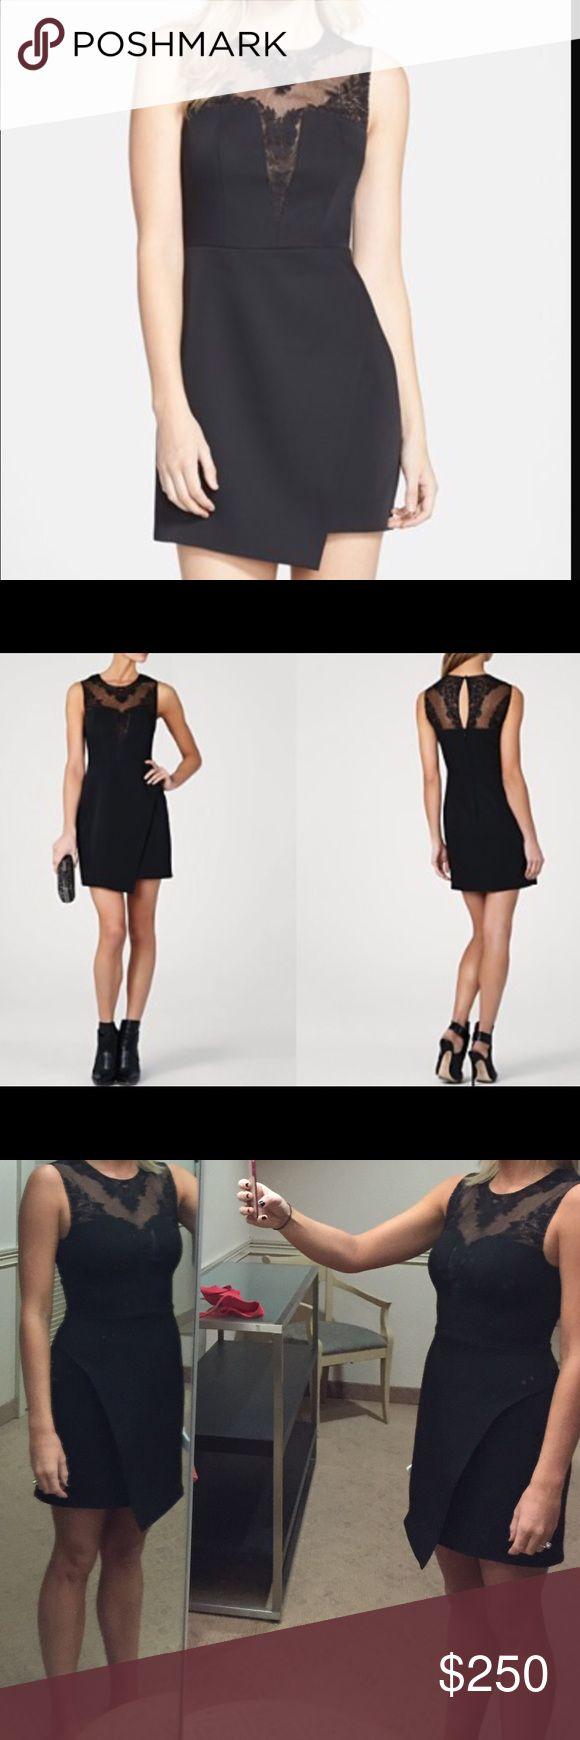 BCBG Maxazria Dress - black Size 4 BCBG Maxazria dress. Black with lace. Short and sleeveless. BCBGMaxAzria Dresses Midi